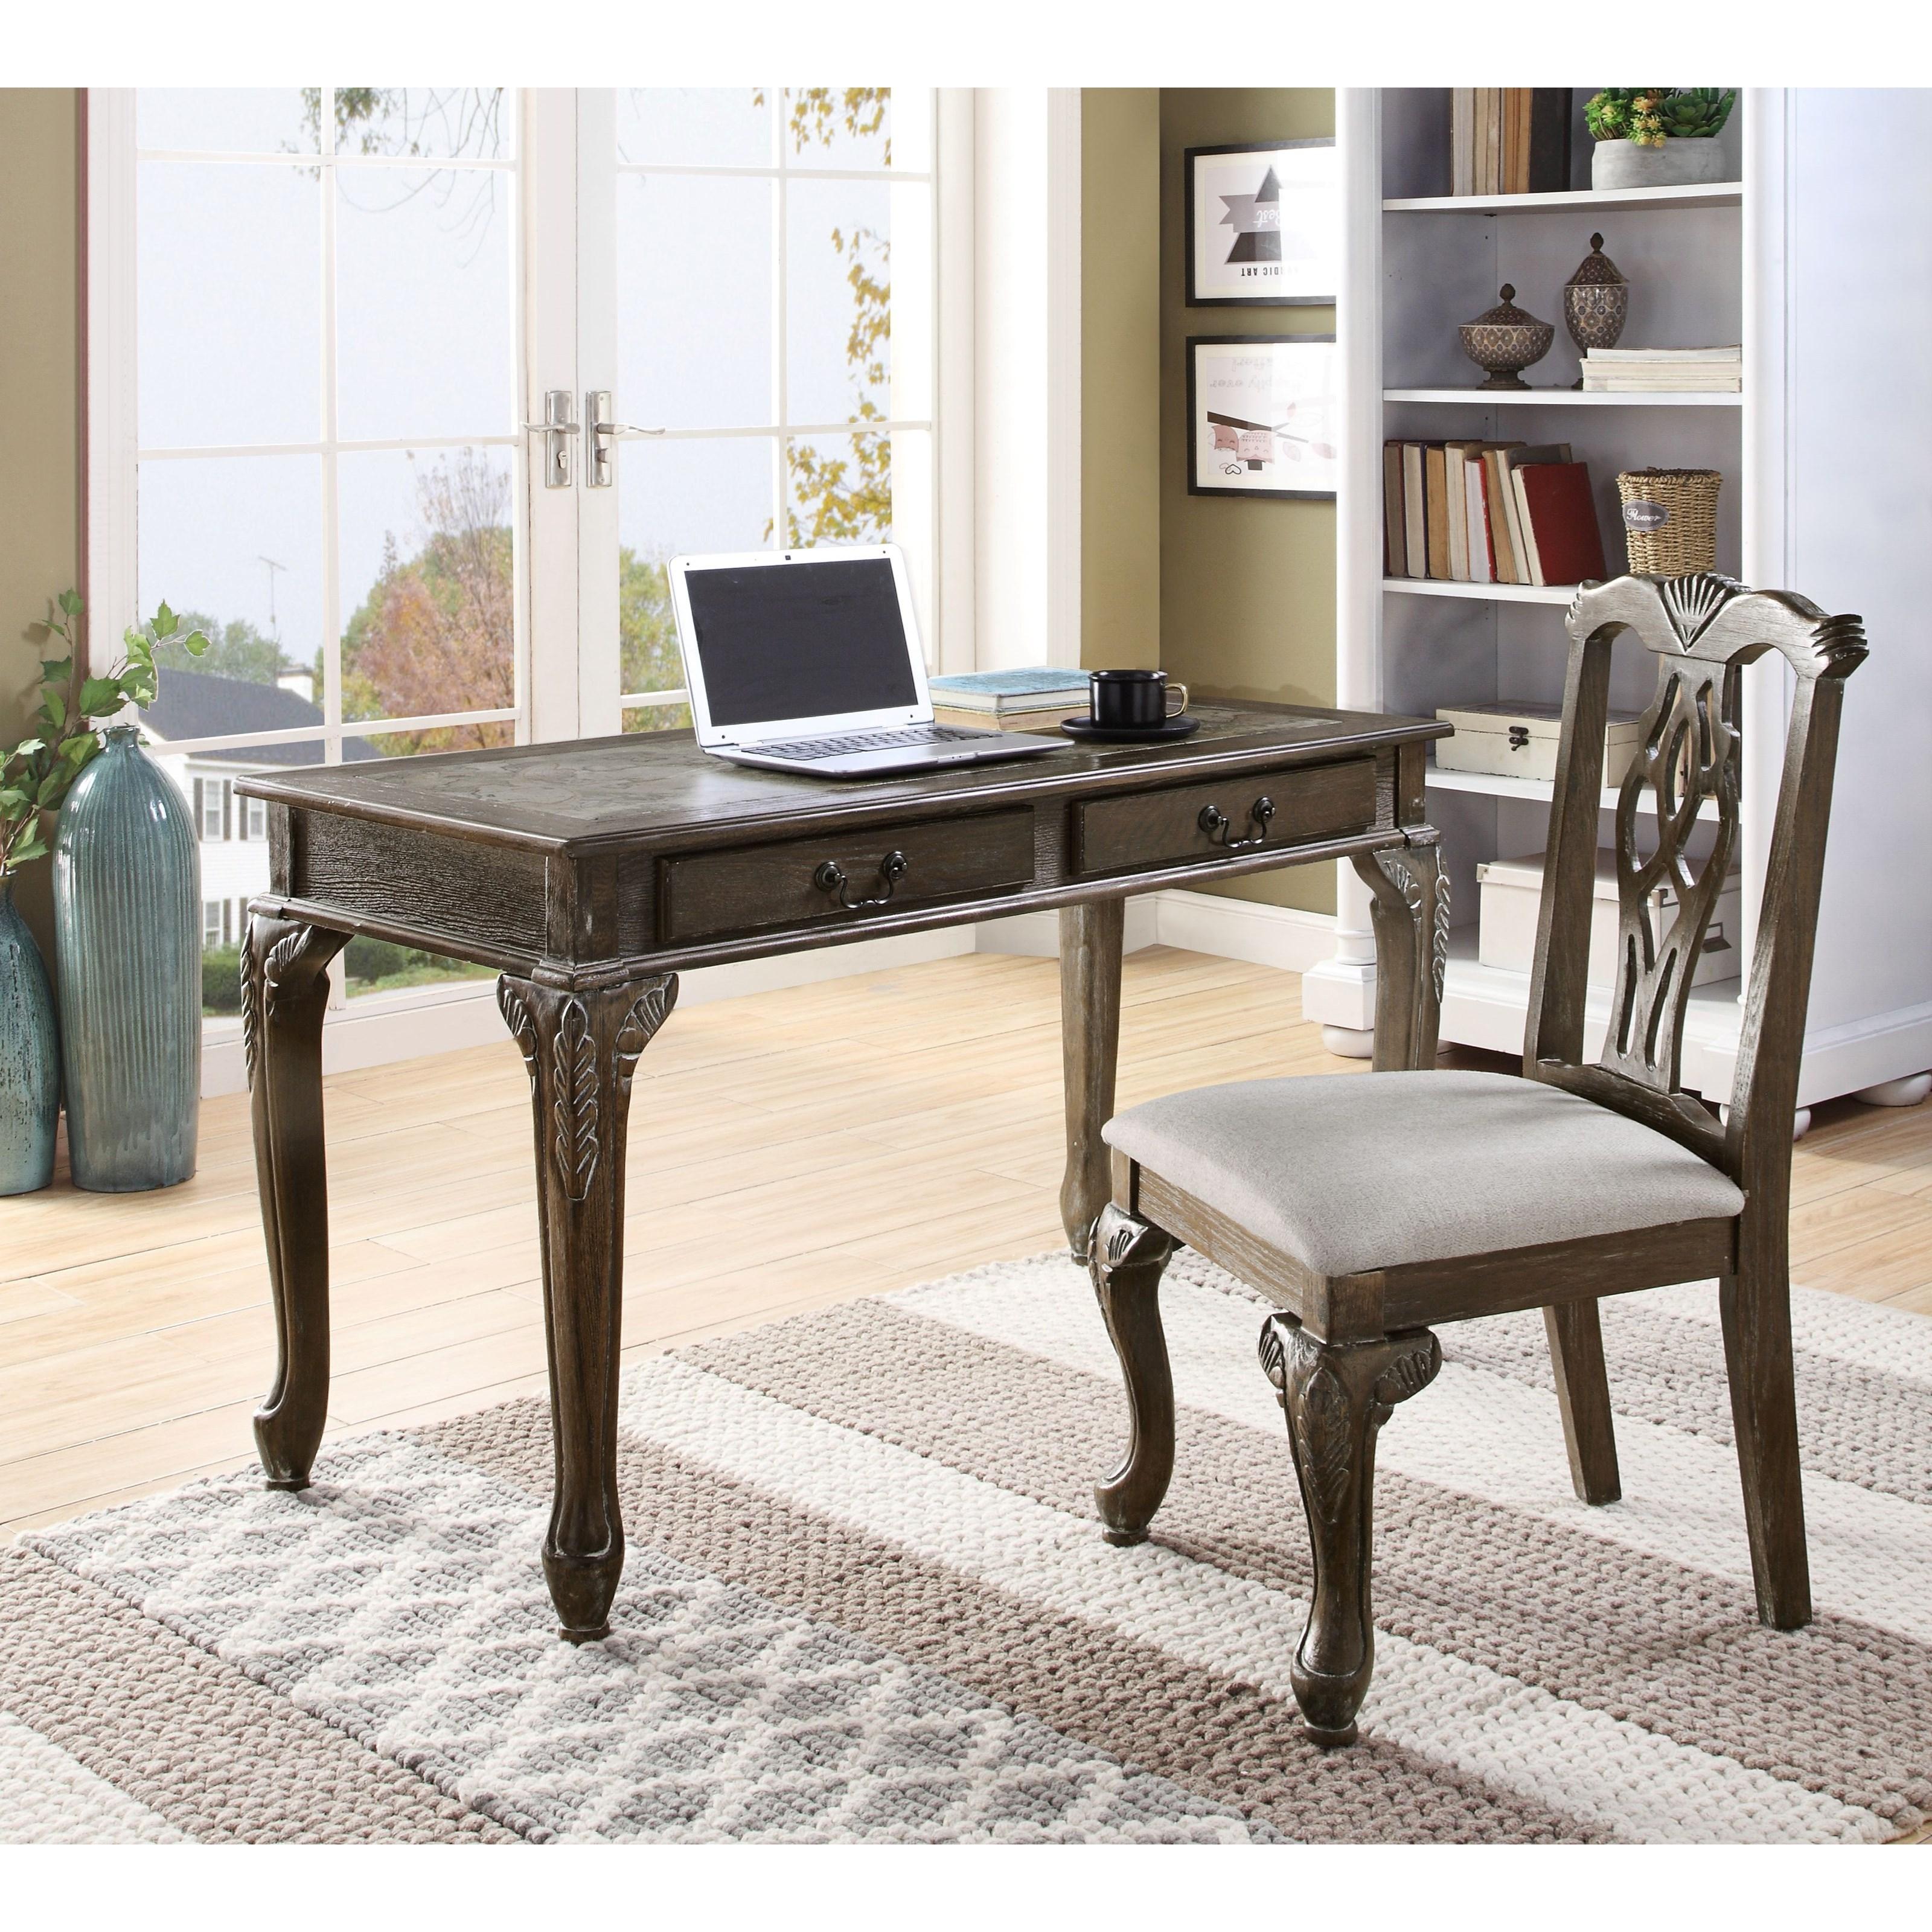 Home Office Desk & Chair Set